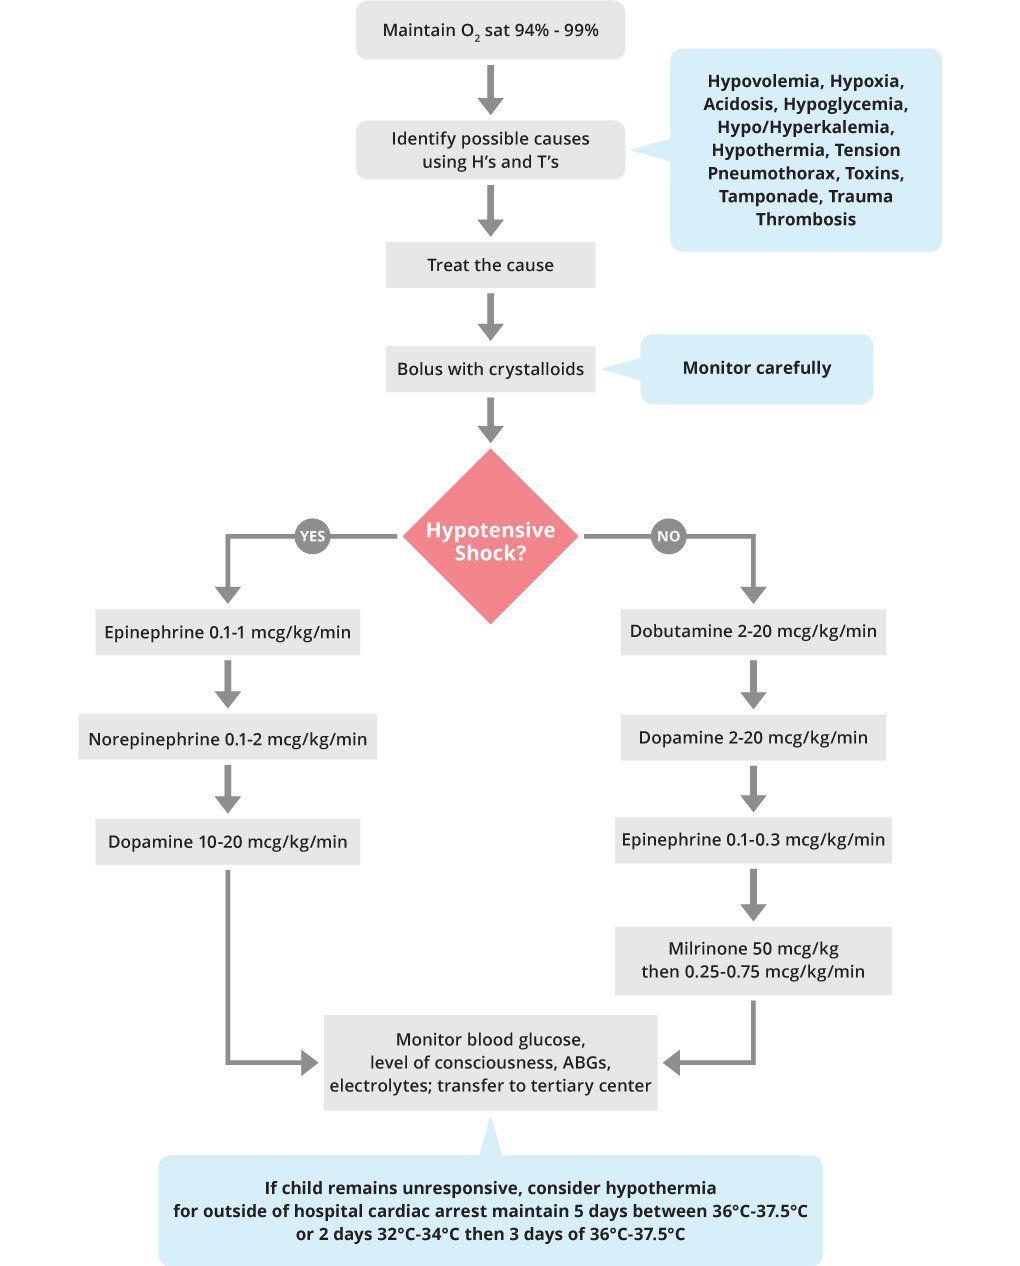 Nursing Mnemonics And Tips Hyperkalemia Hyperkalemia Is Defined As